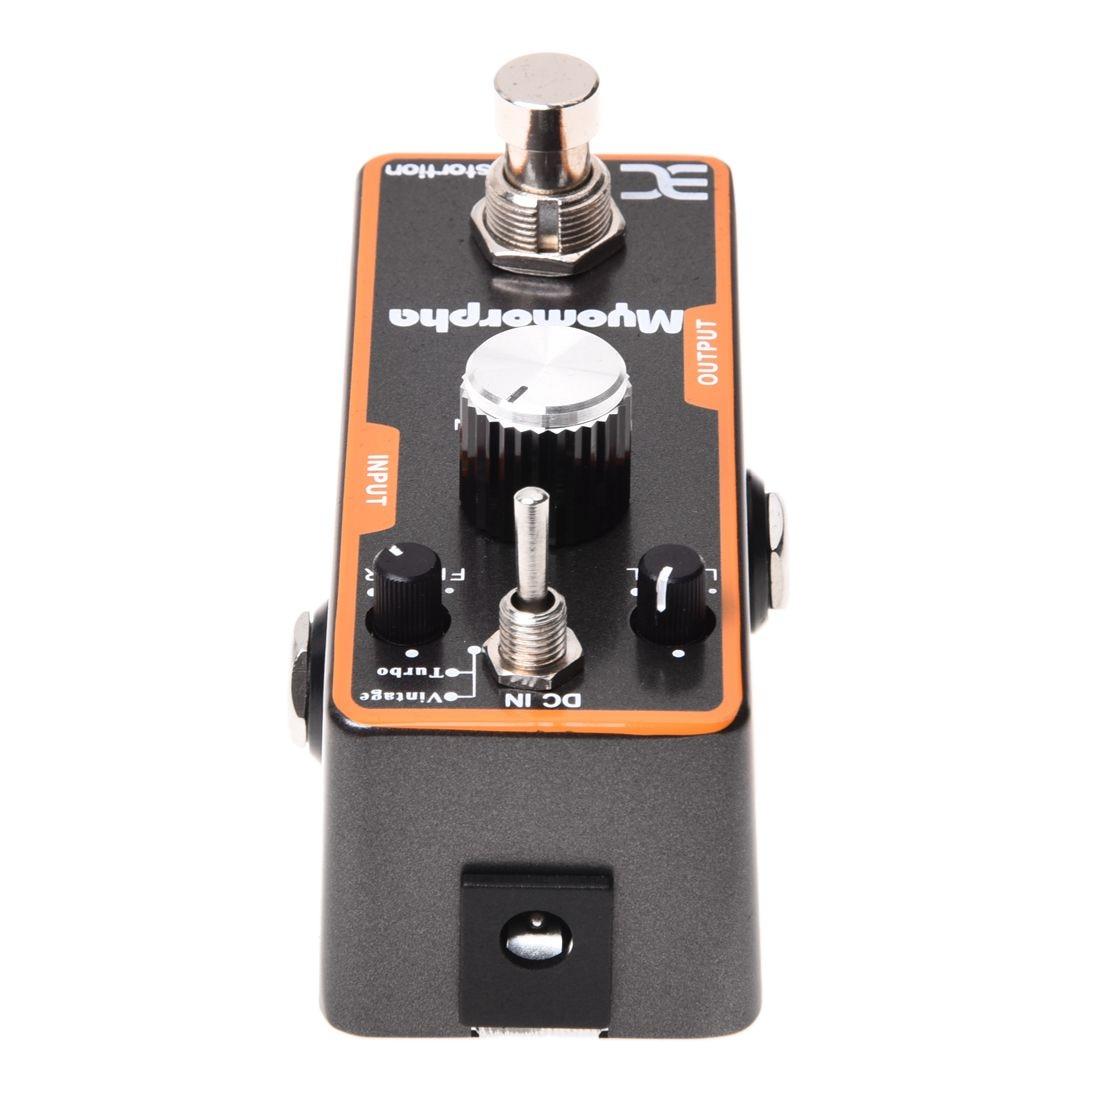 ENO TC-13 Music Distortion Mini Pedal Myomorpha True Bypass tc electronic dark matter distortion